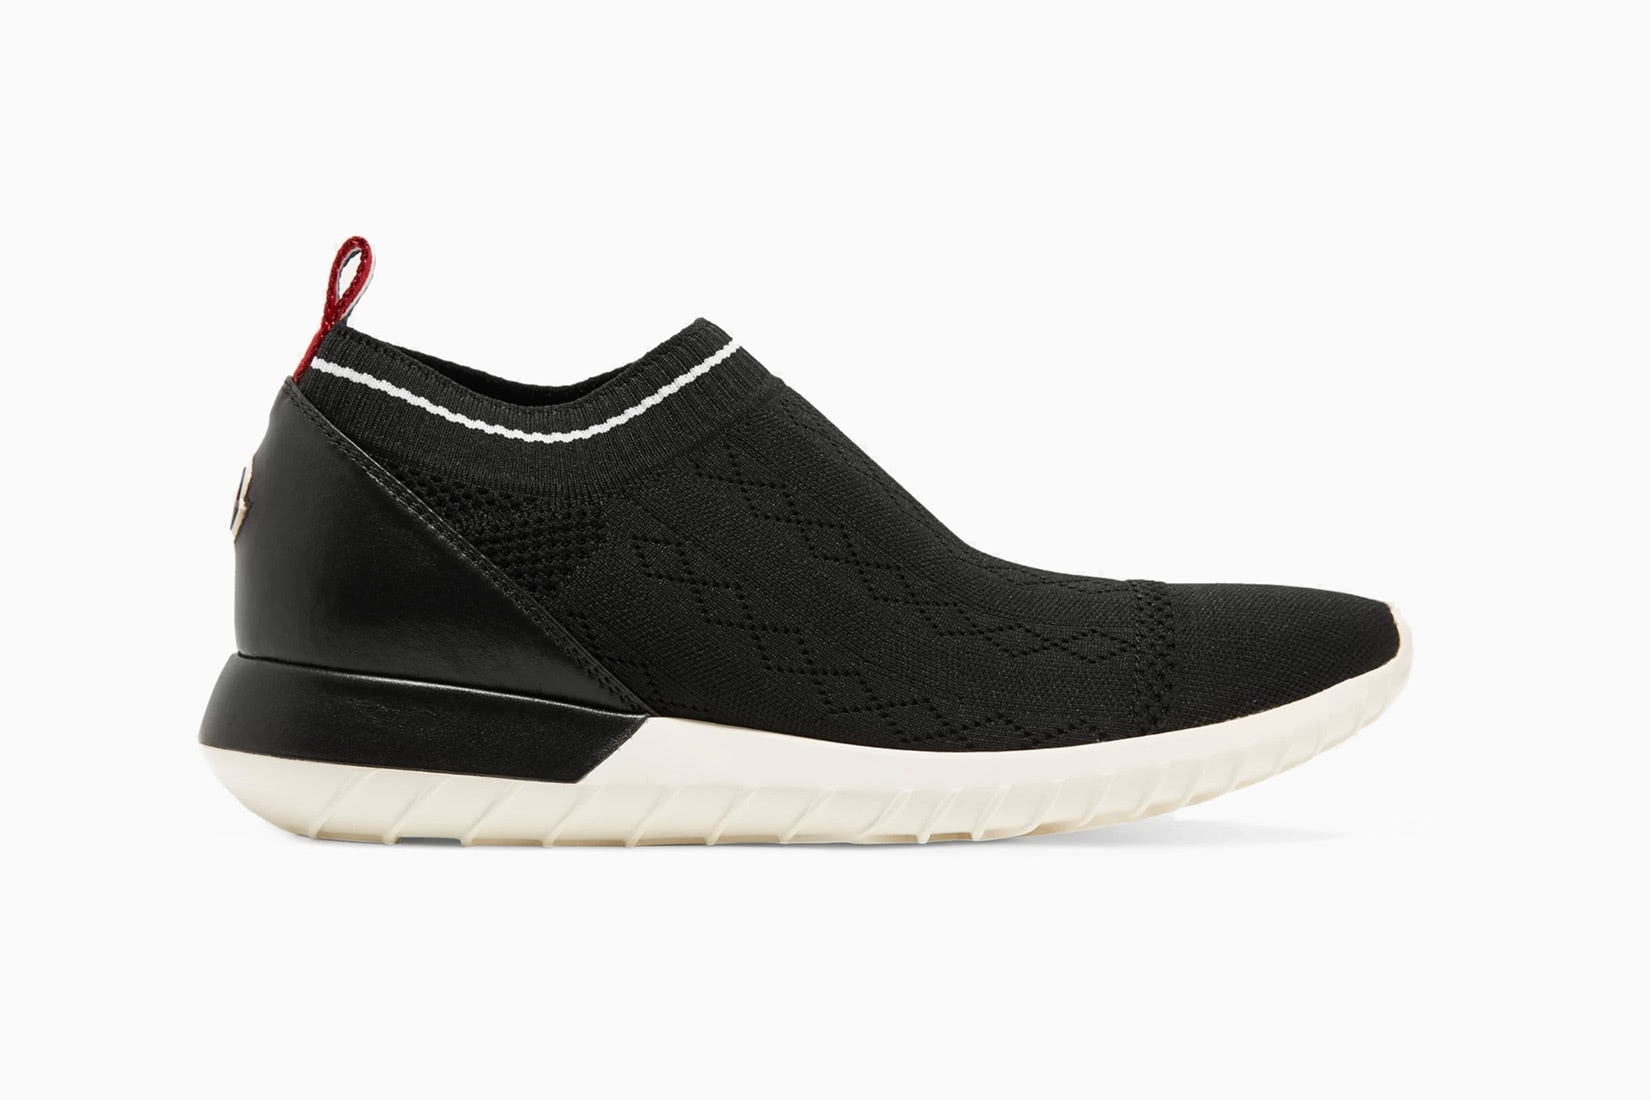 best women walking shoes moncler giroflee sneakers - Luxe Digital